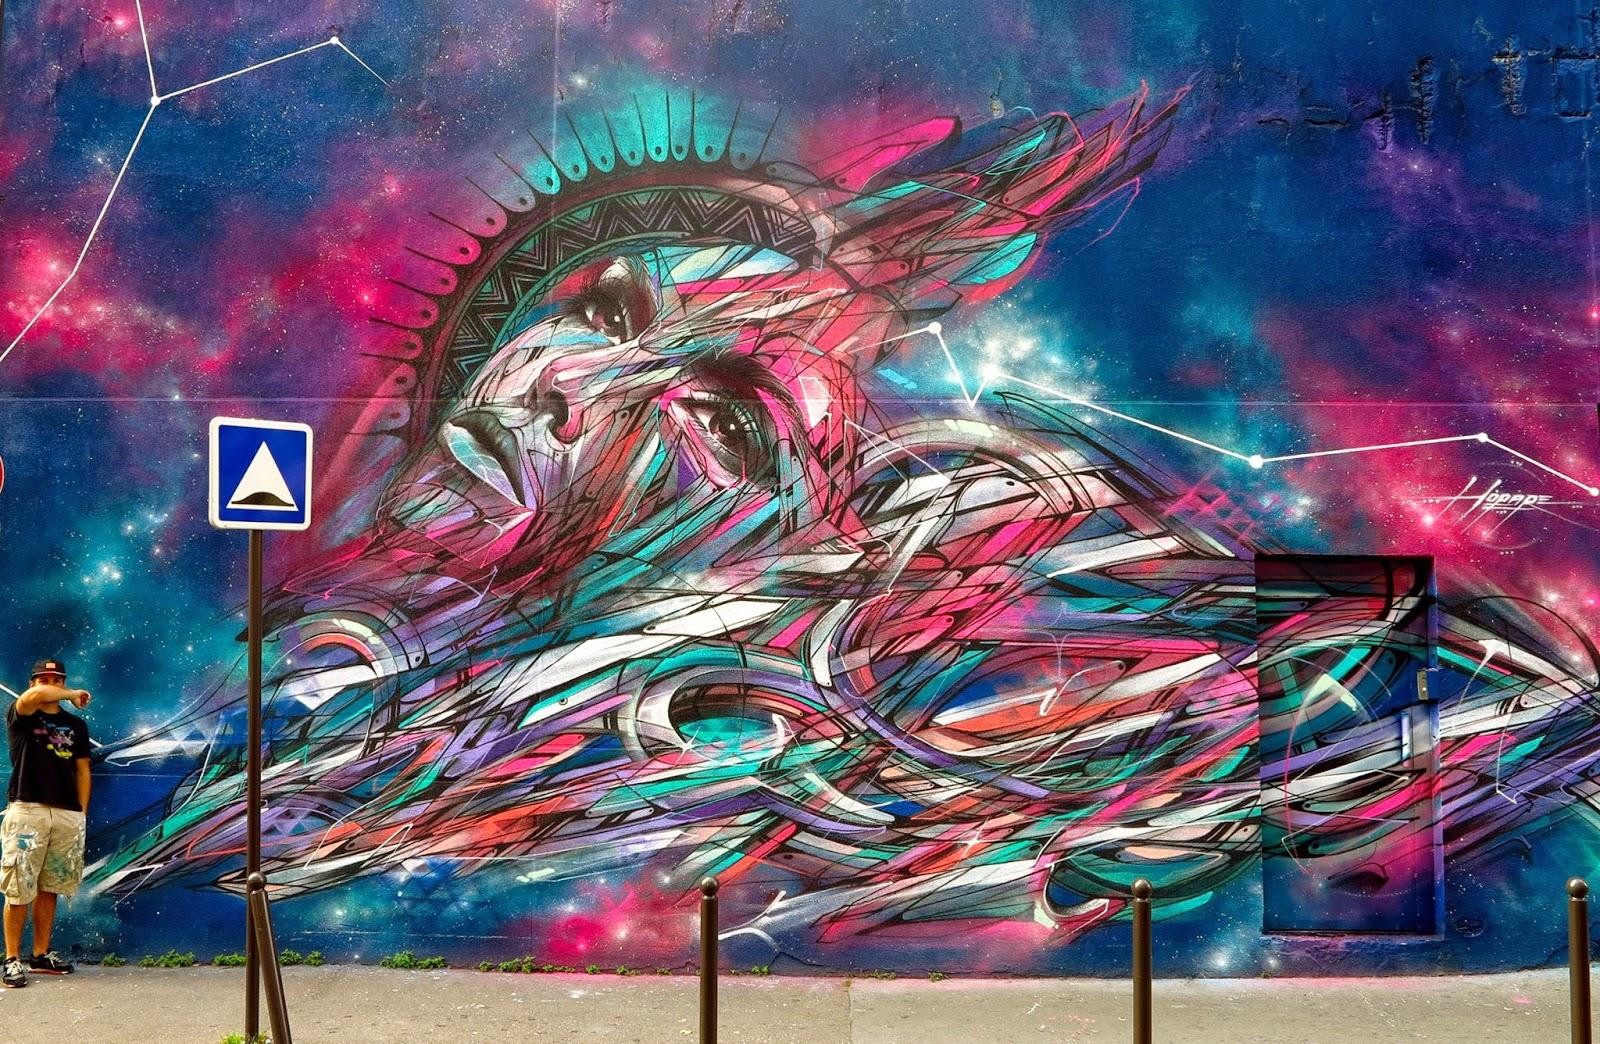 Hopare New Mural - Paris 20th, France